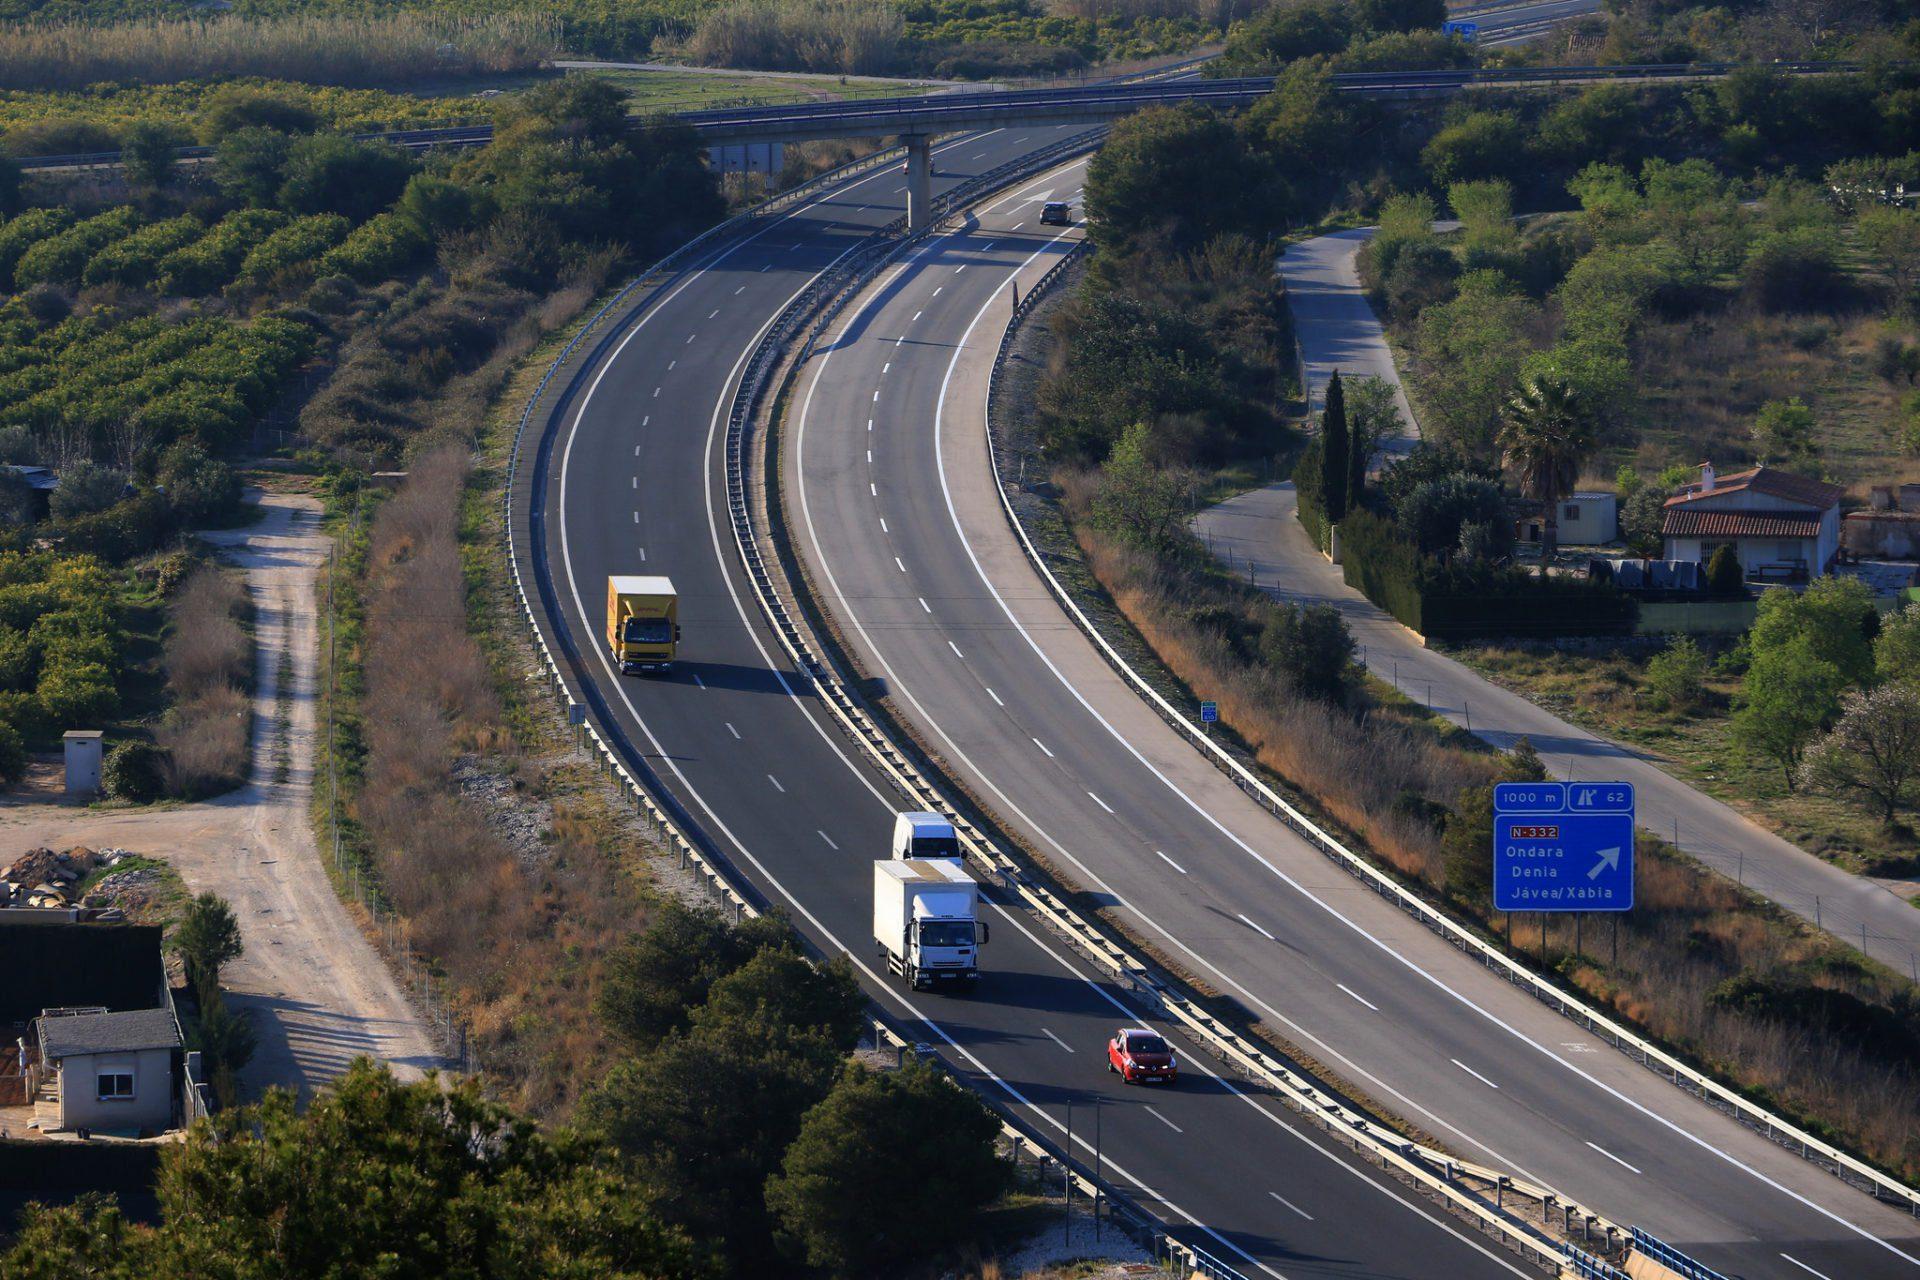 Route A-7, Autovía del Mediterráneo